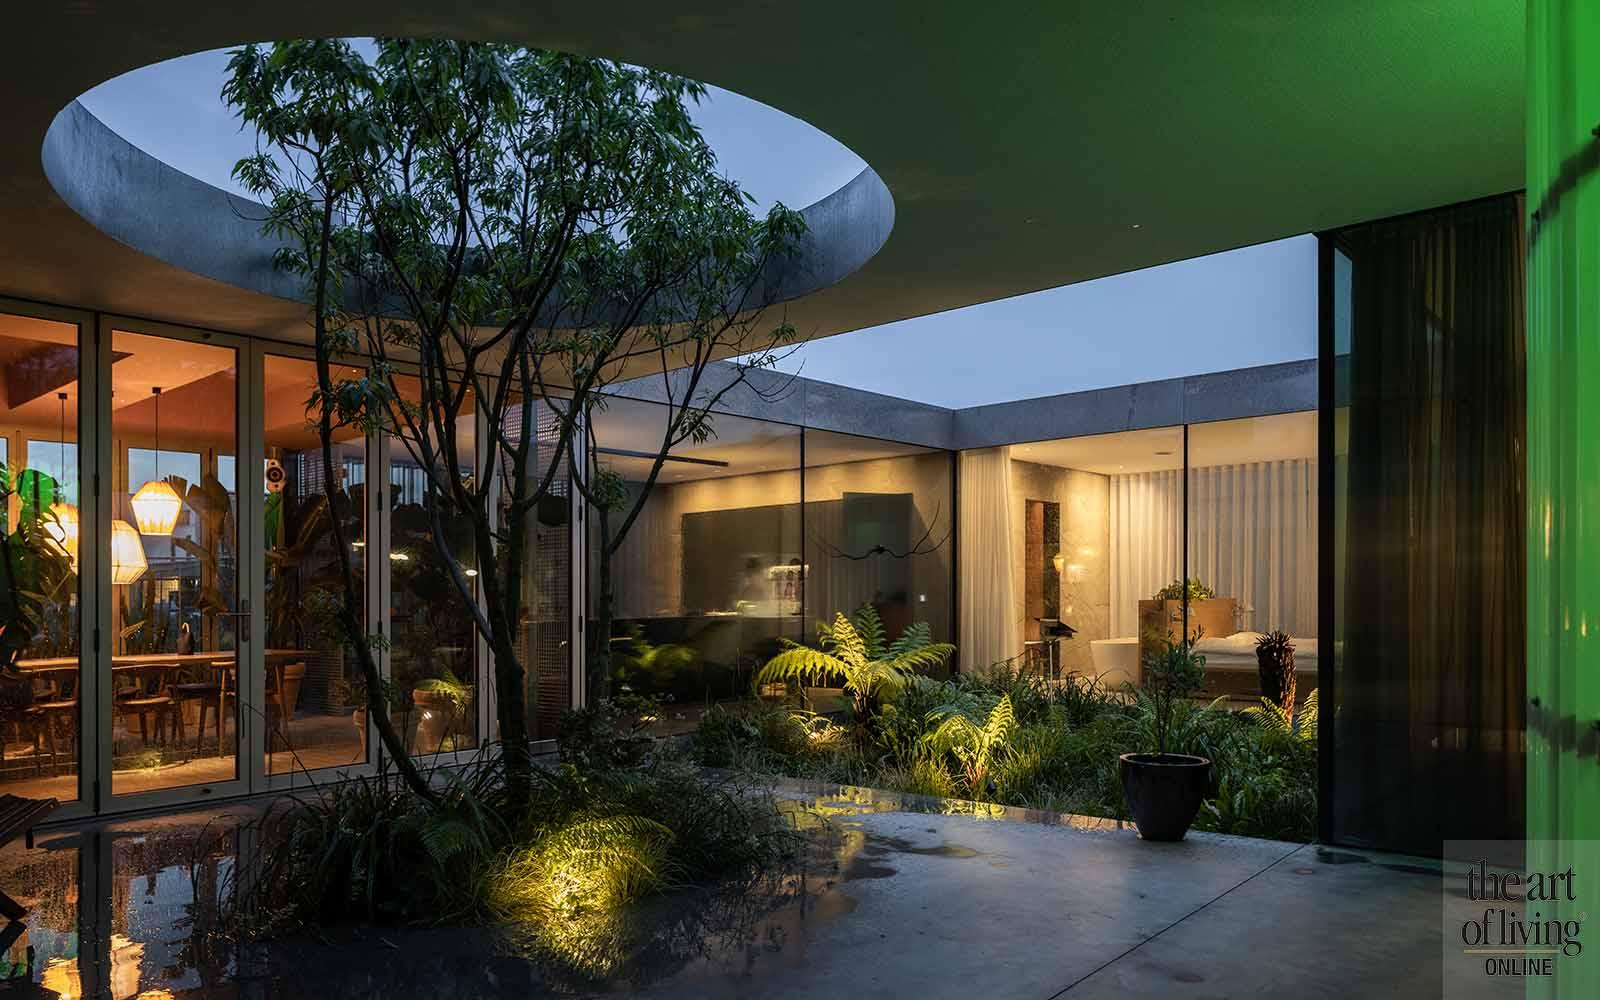 Industrieel interieur | Buytels, the art of living